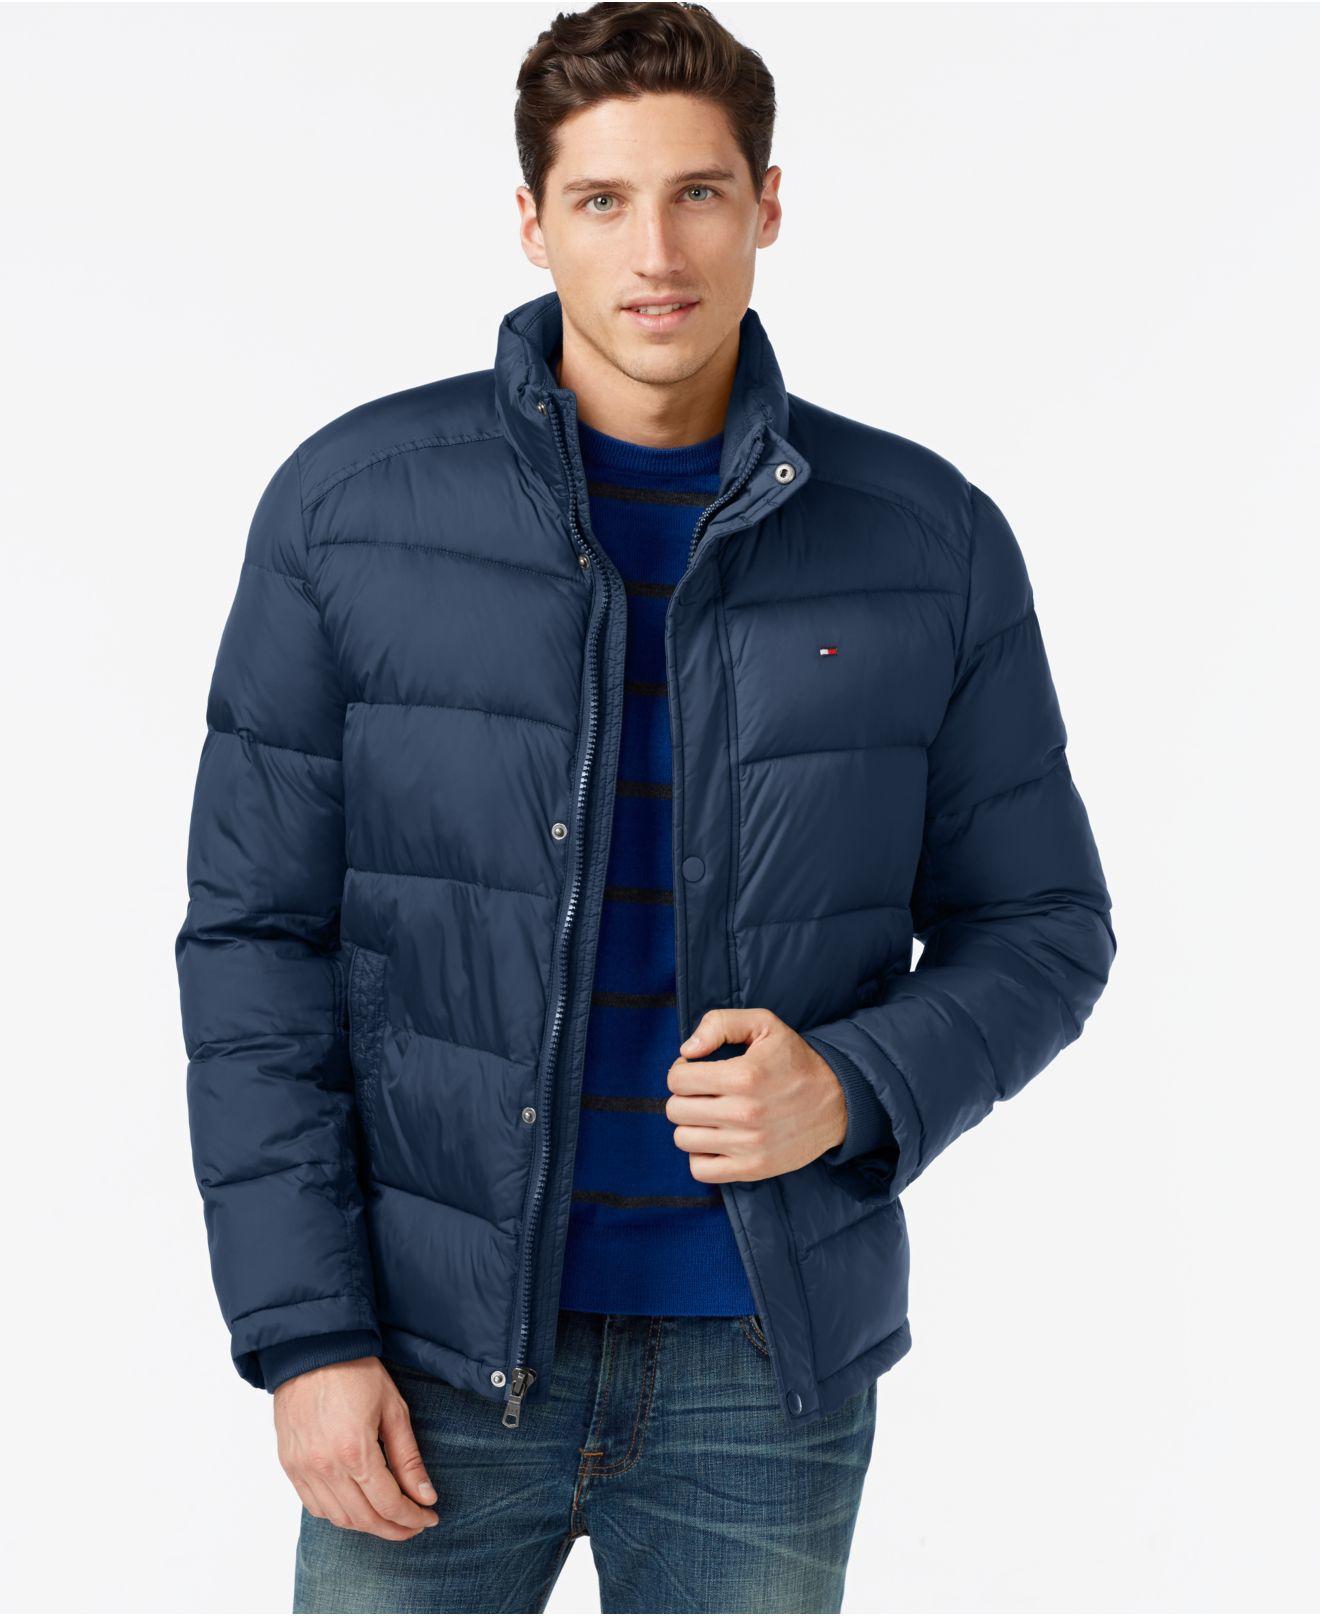 tommy hilfiger classic puffer jacket in blue for men new navy lyst. Black Bedroom Furniture Sets. Home Design Ideas